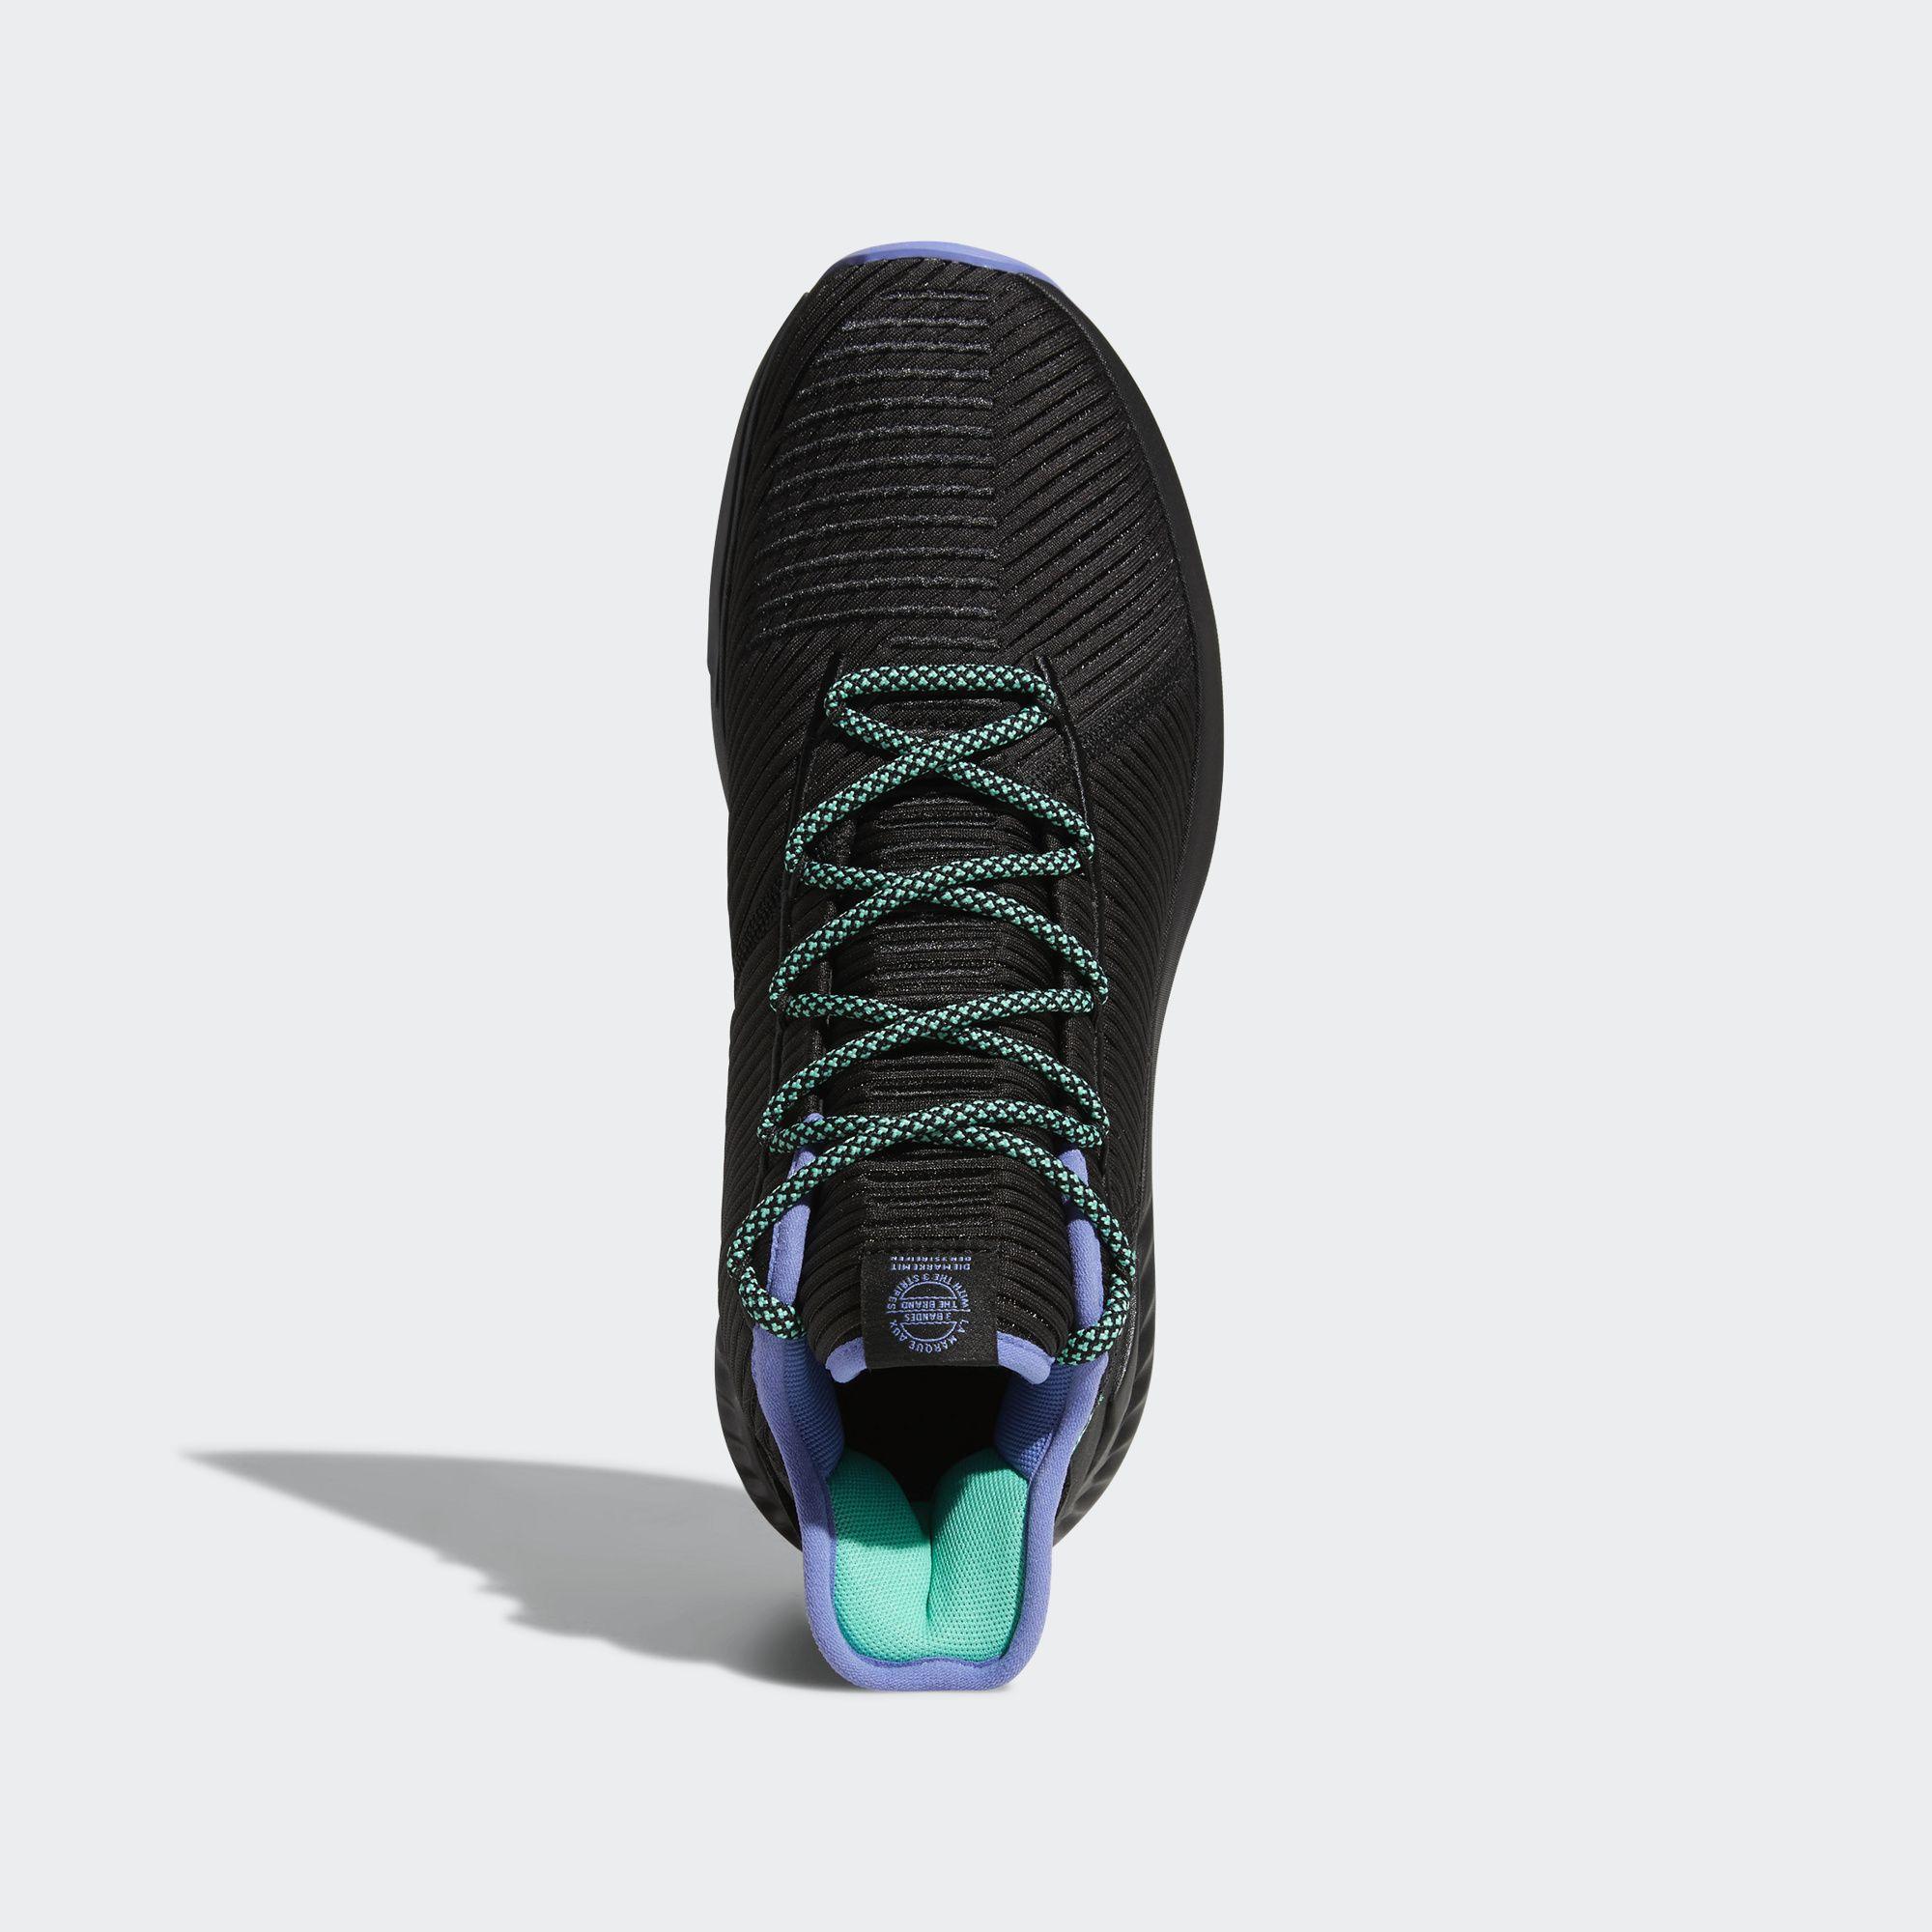 adidas d rose 9 black green top